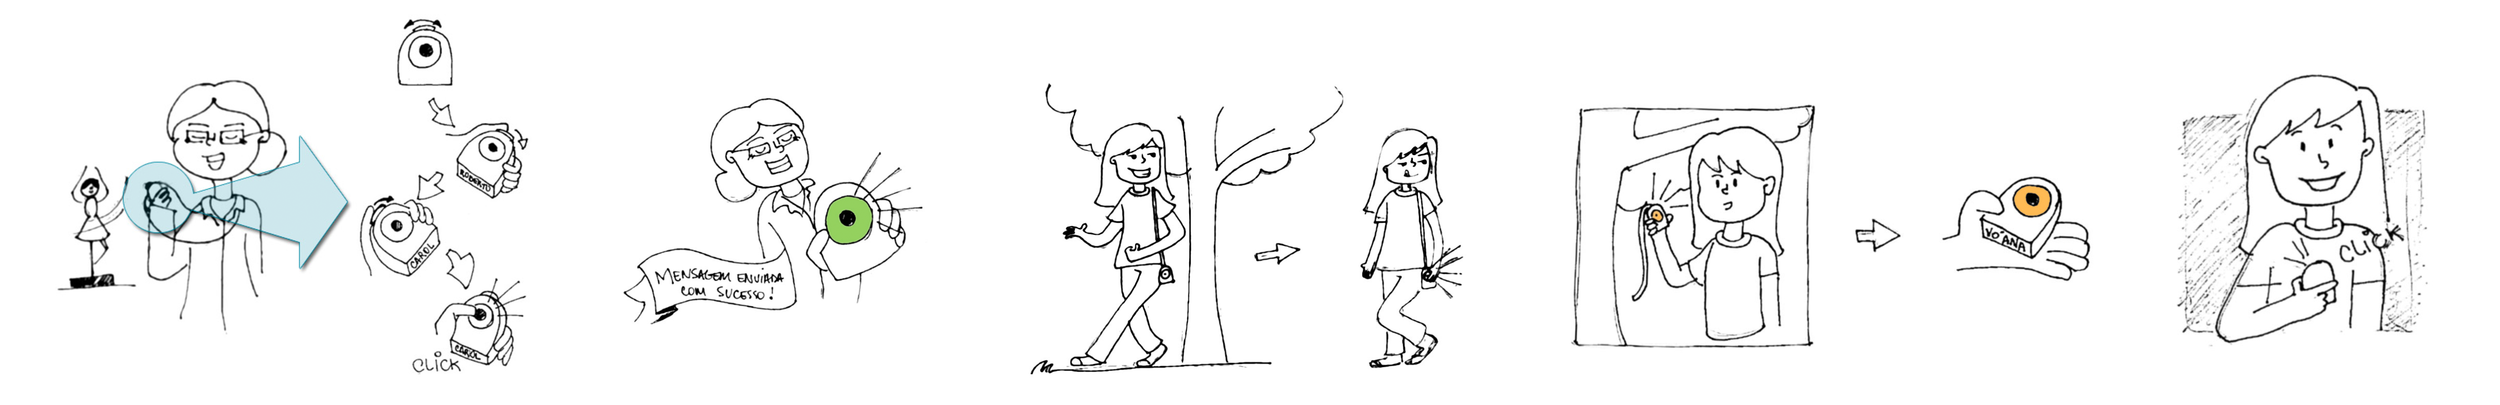 Example of one of the User Scenarios